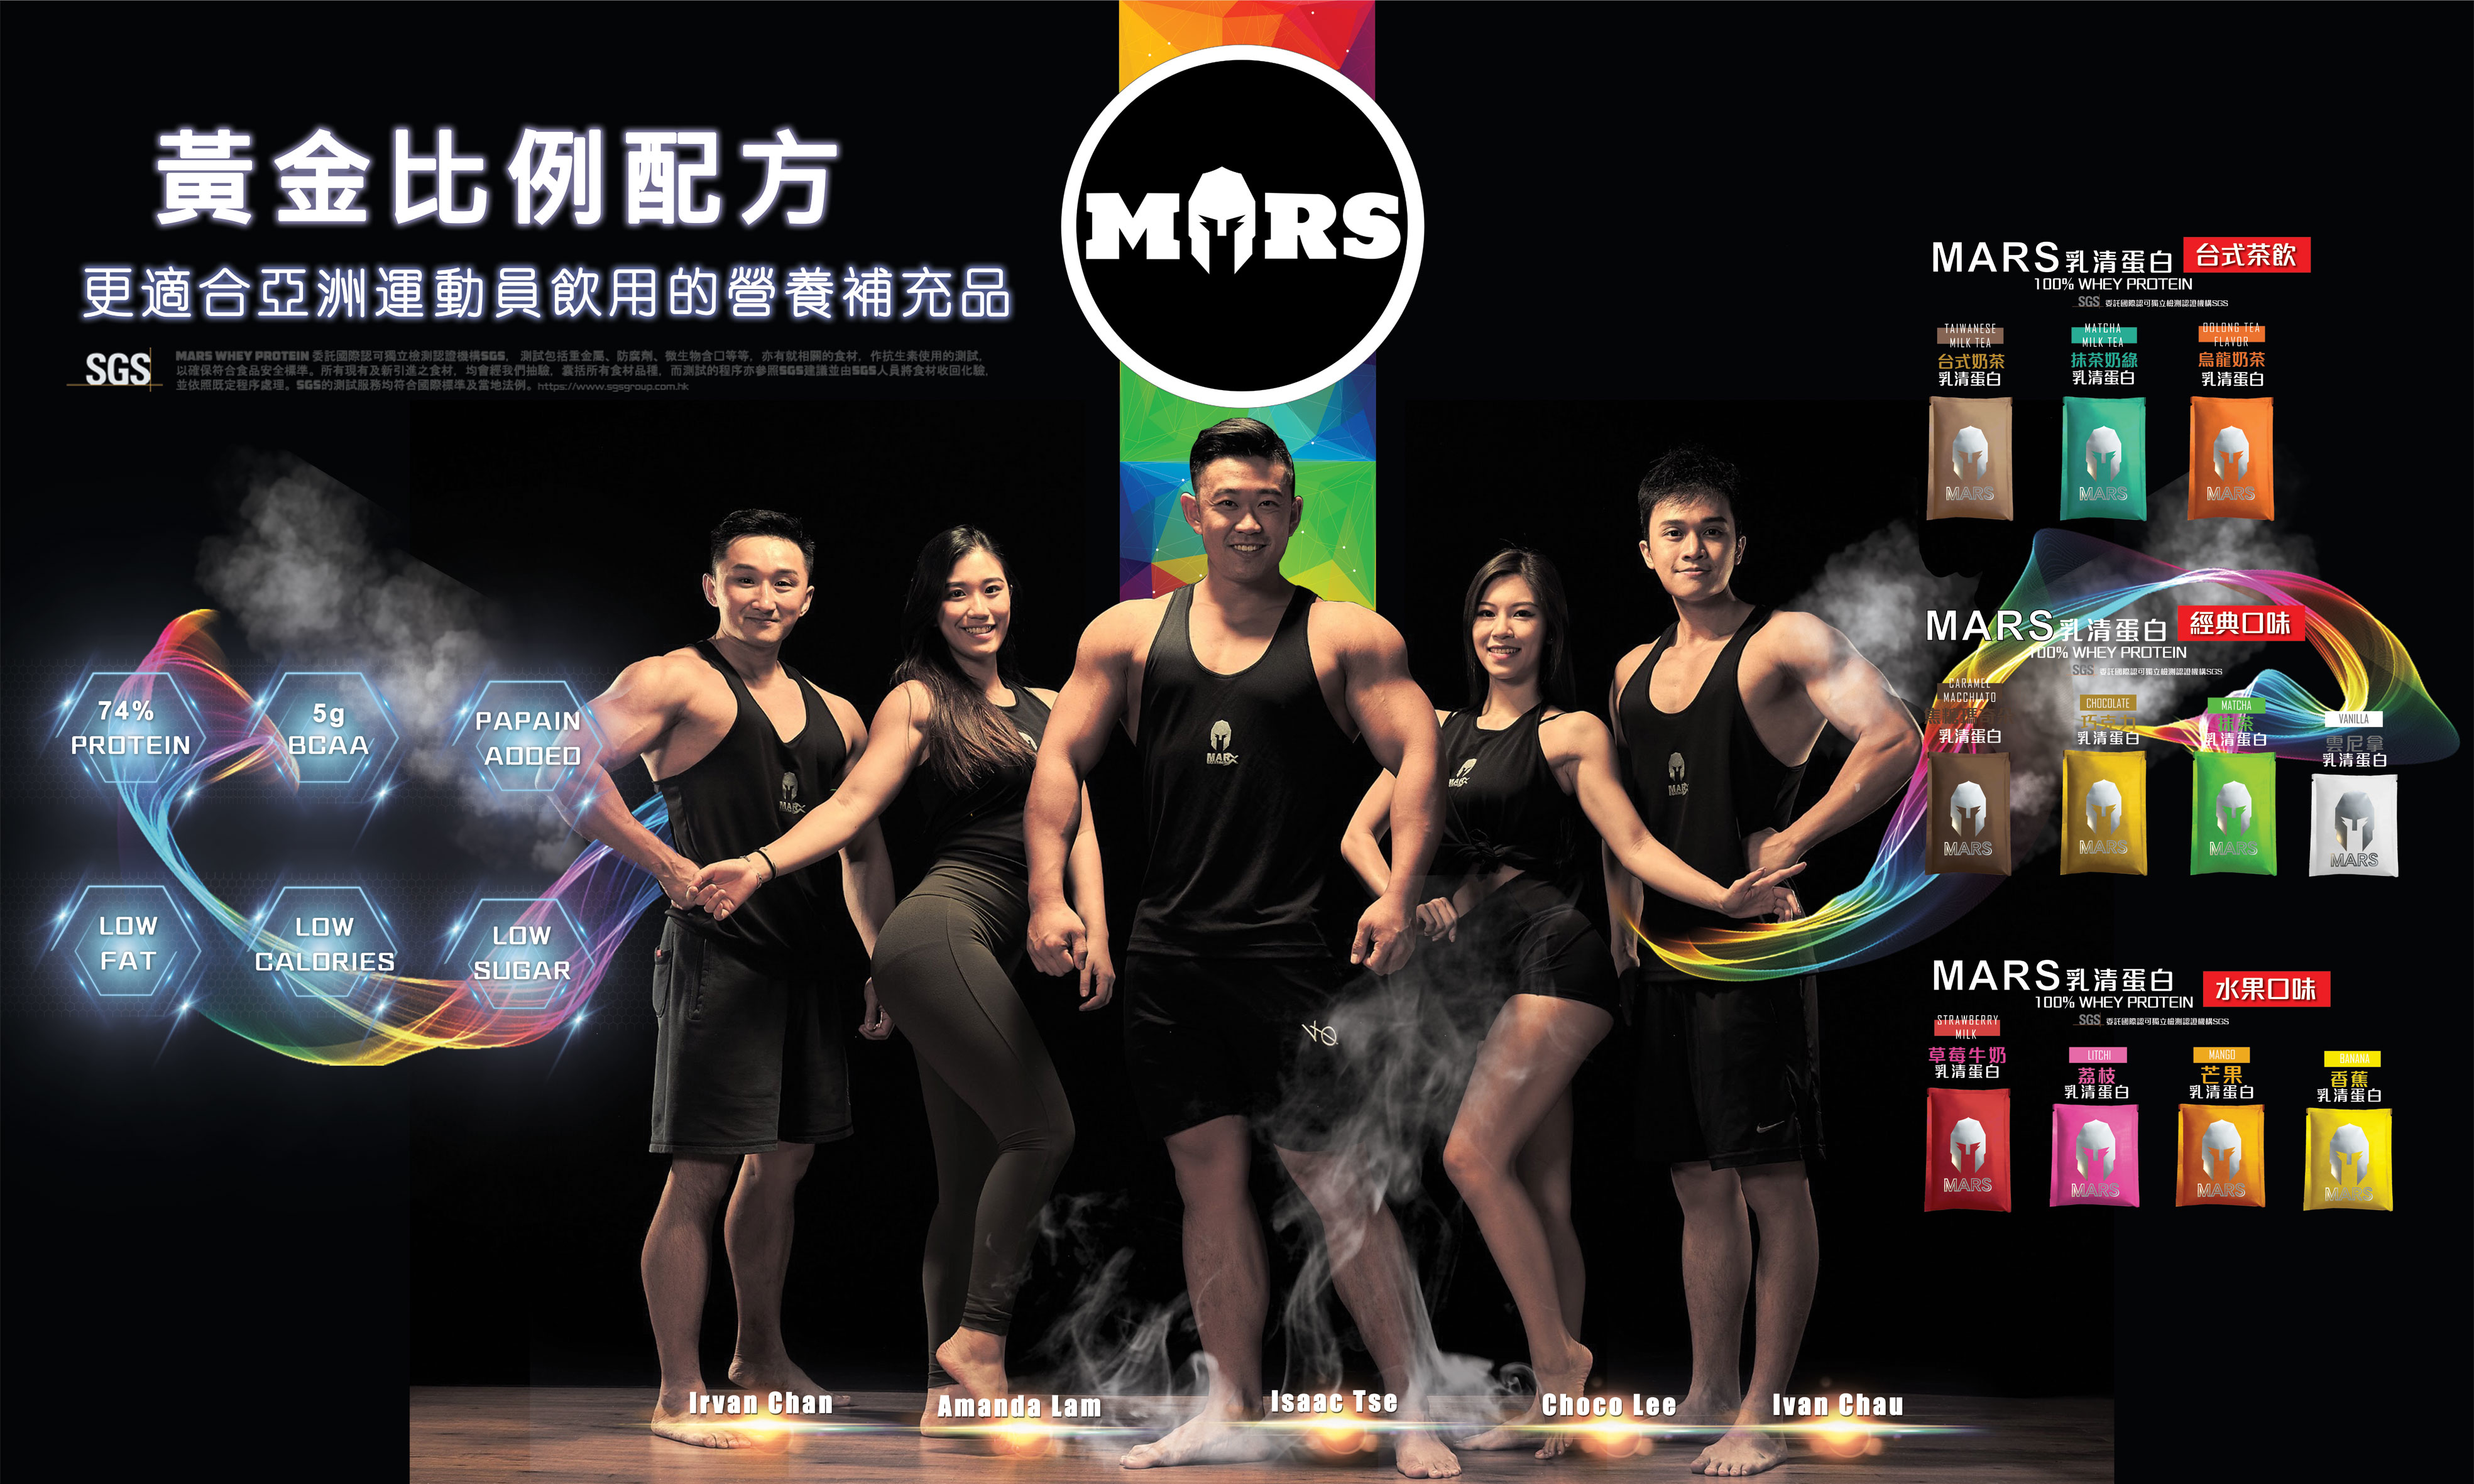 Mars Hong Kong 低脂系列乳清蛋白